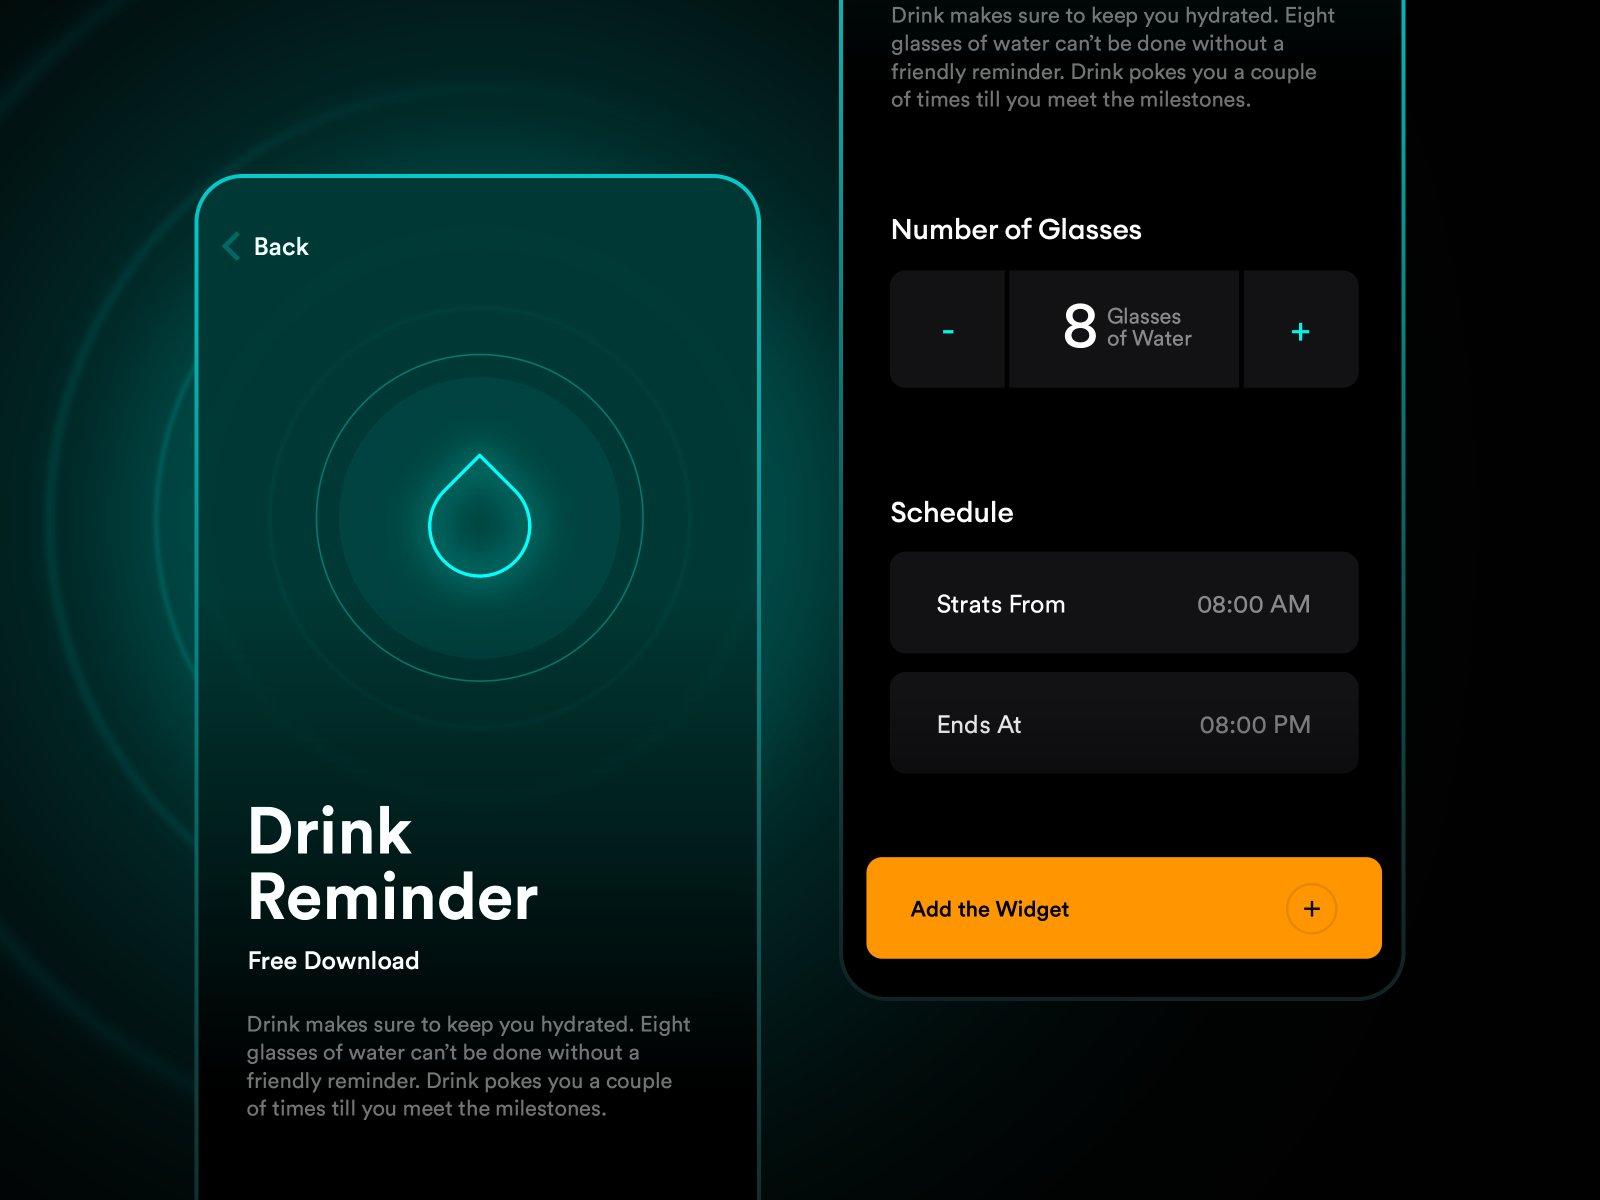 Water-drinking app reminder